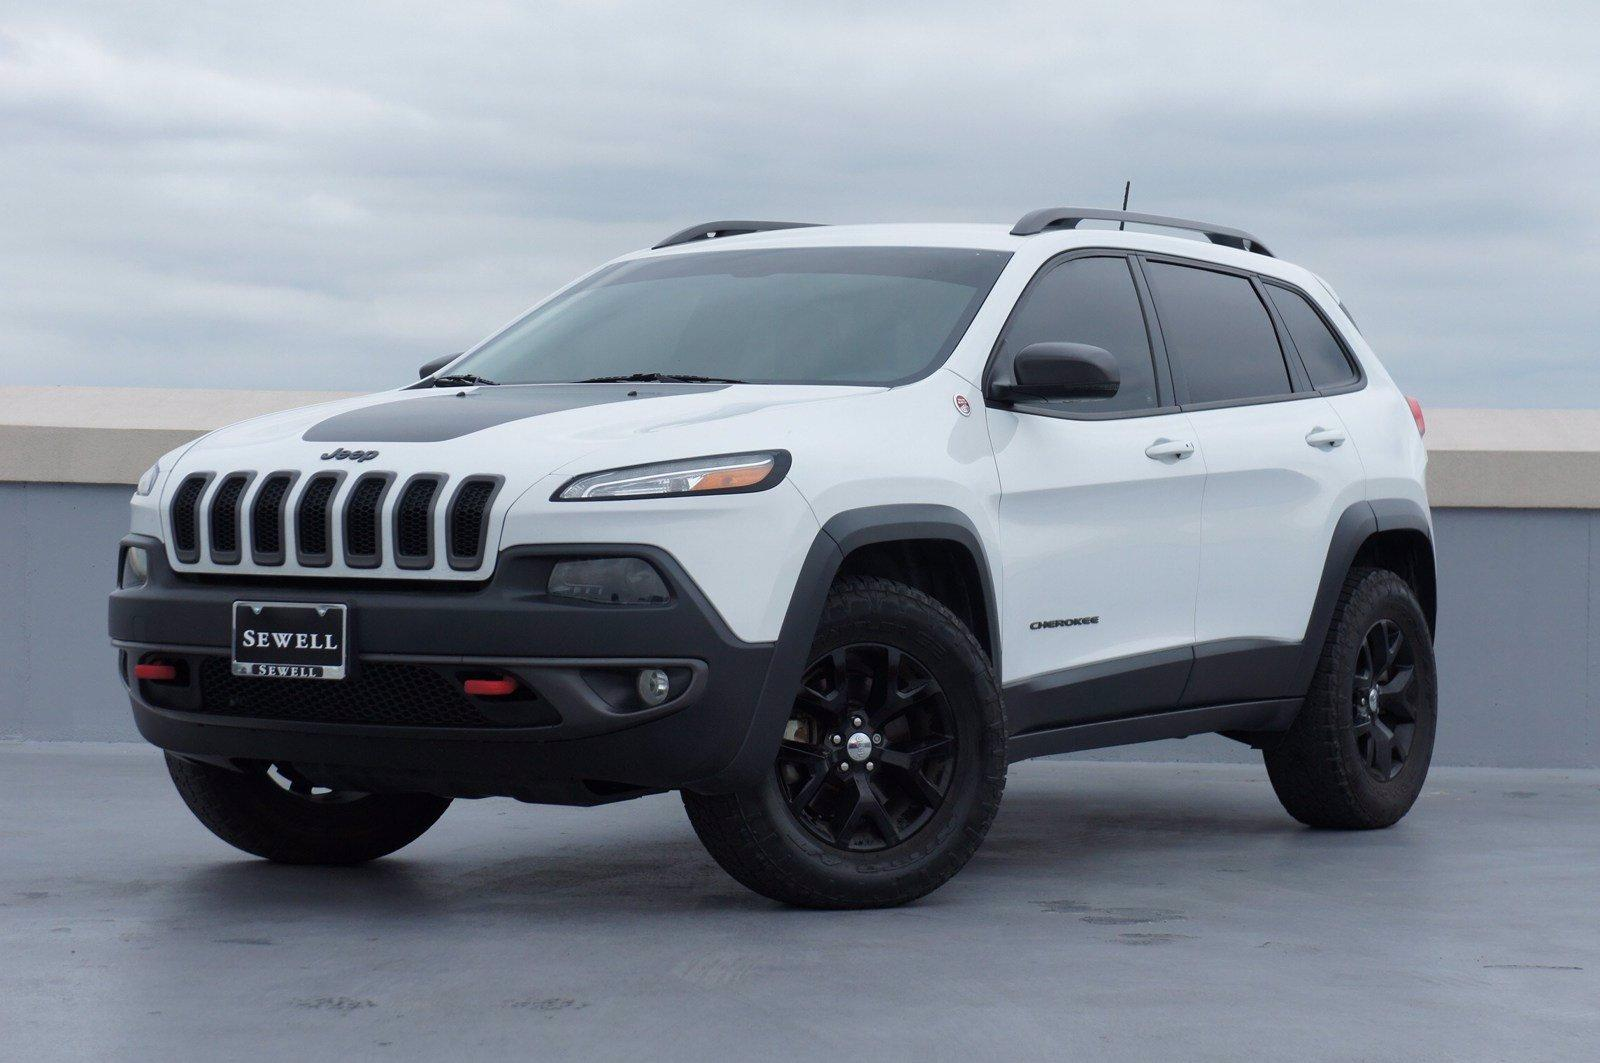 2016 Jeep Cherokee Vehicle Photo in Dallas, TX 75209